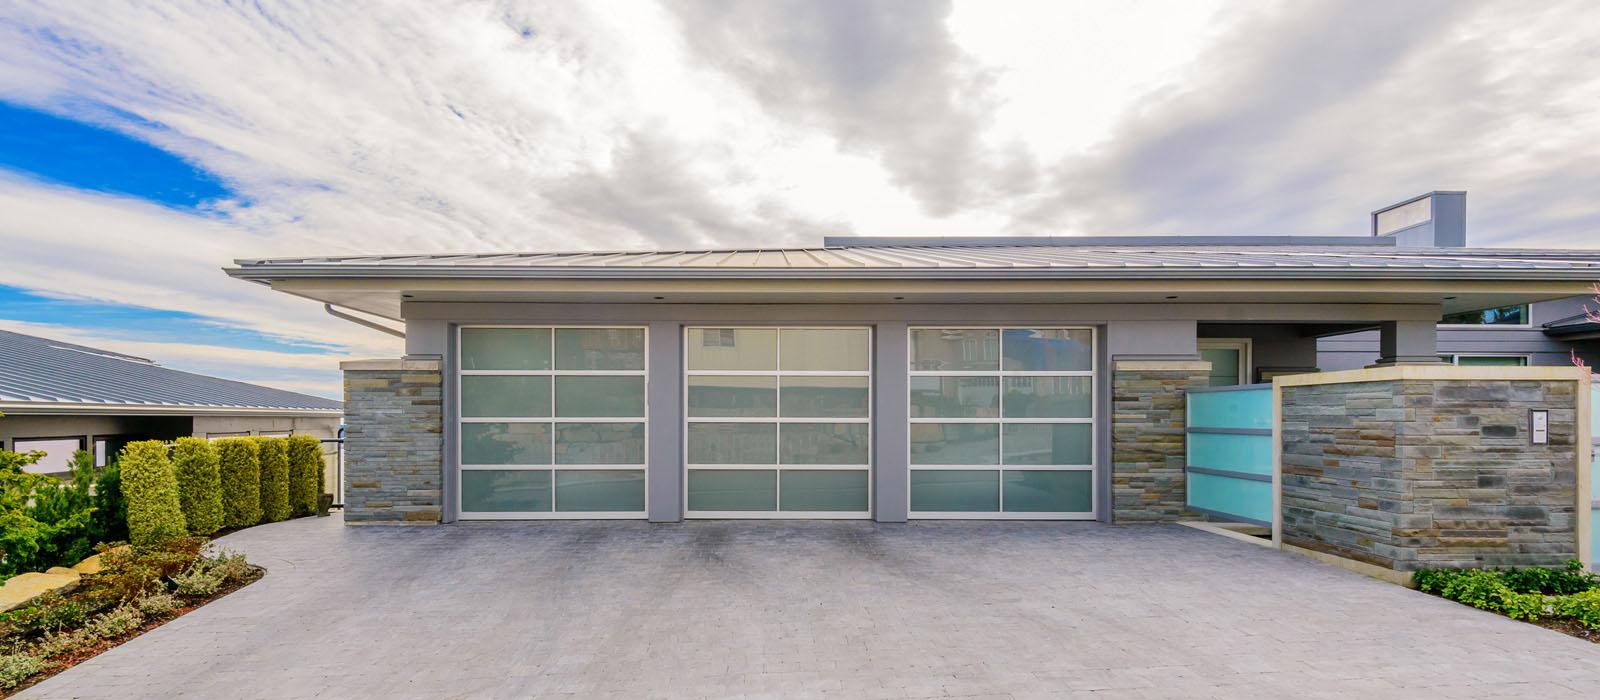 GDR  Garage Door Repair Los Angeles CA  323 8250300